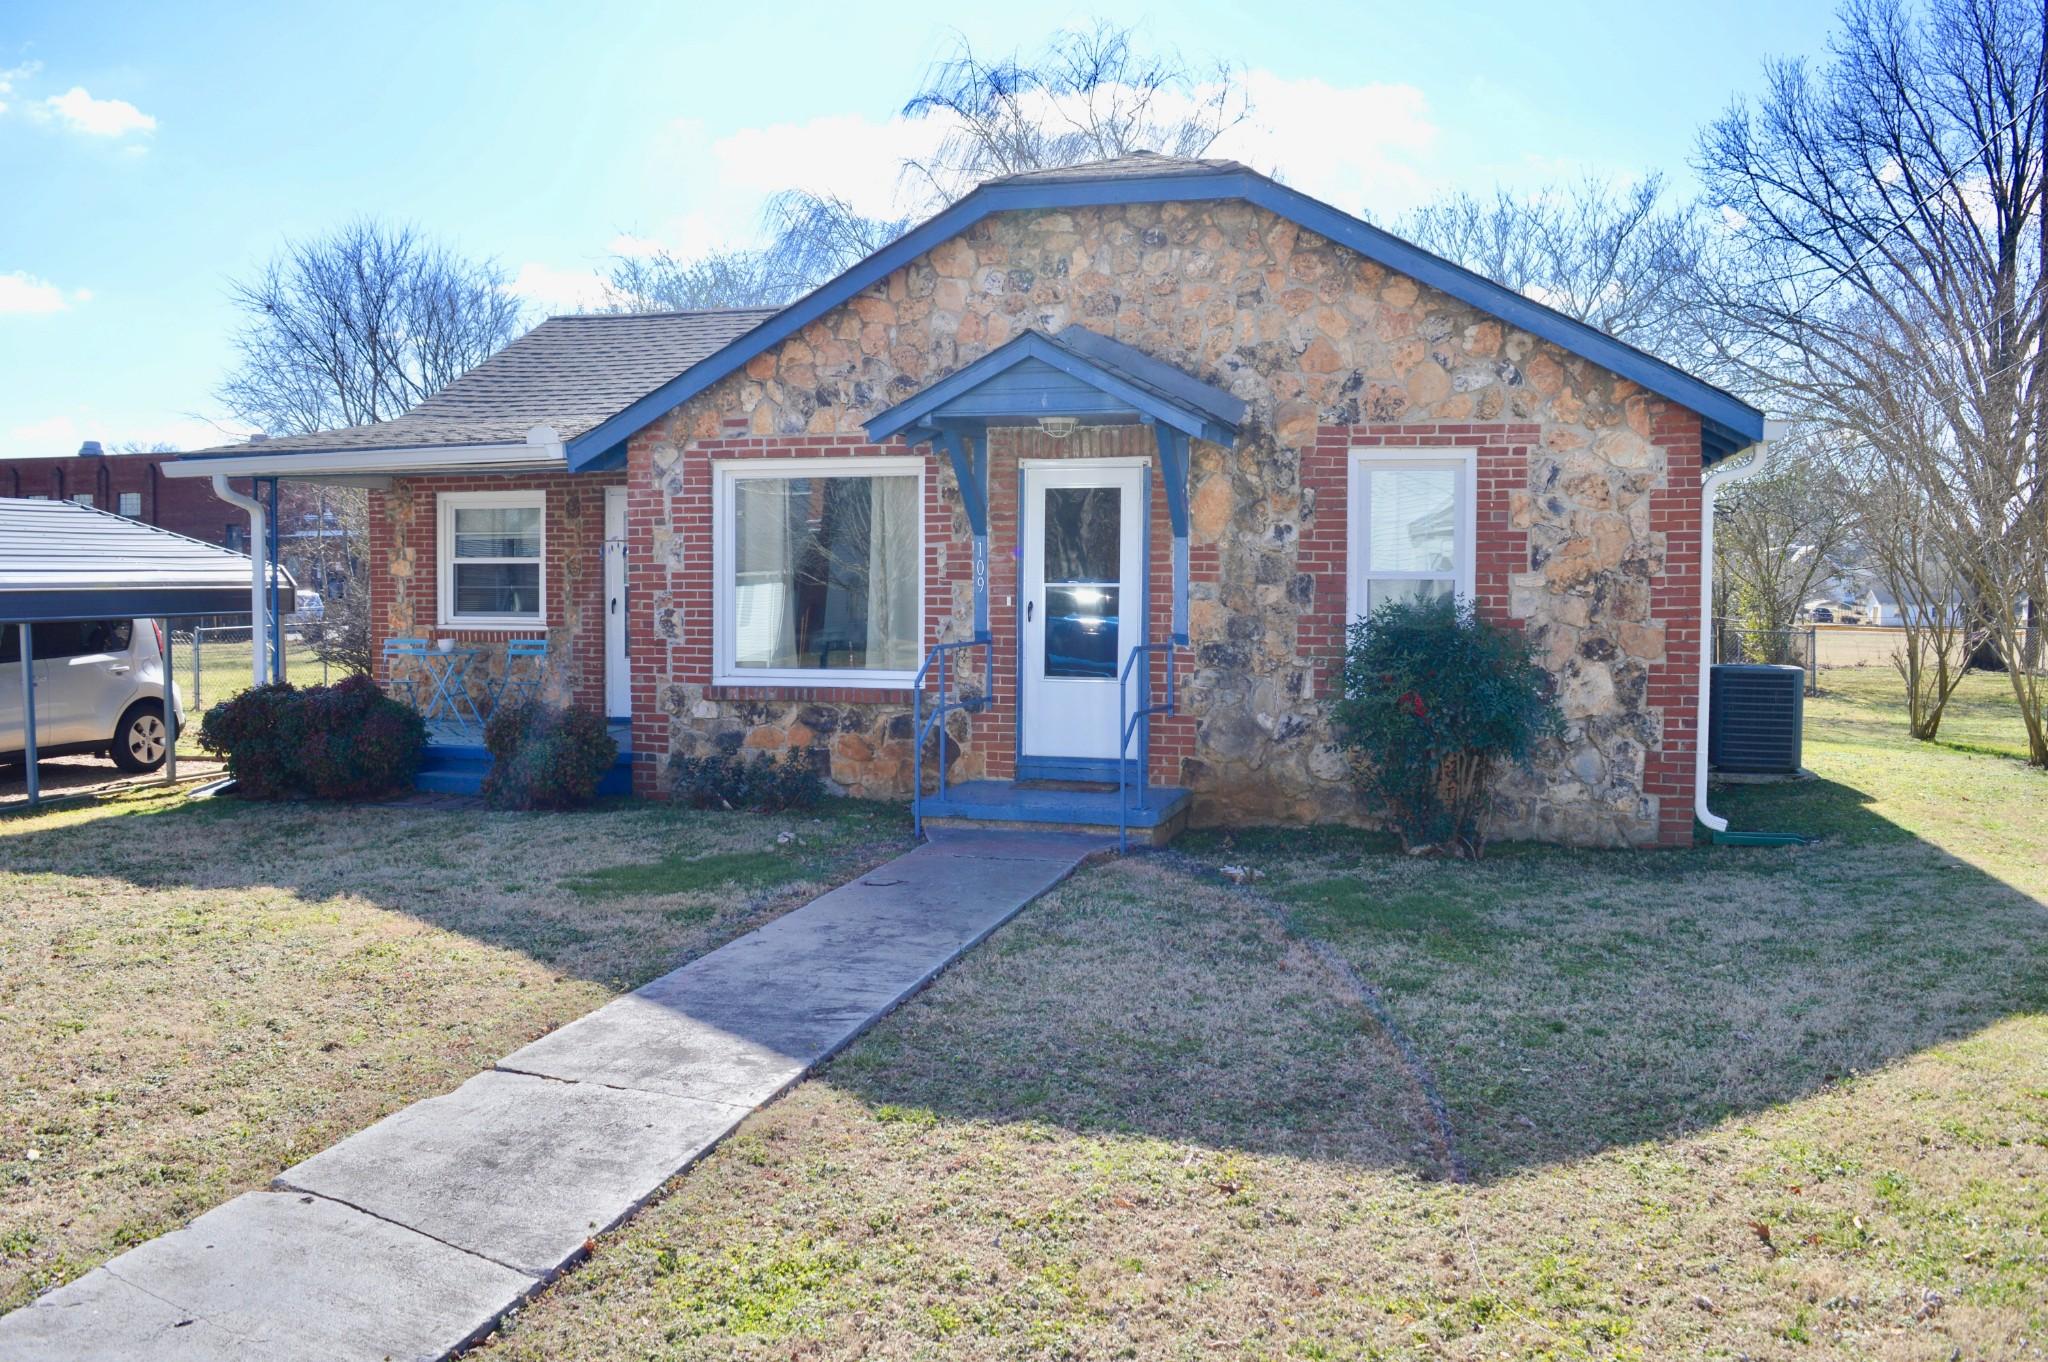 109 Poplar St N Property Photo - Cowan, TN real estate listing